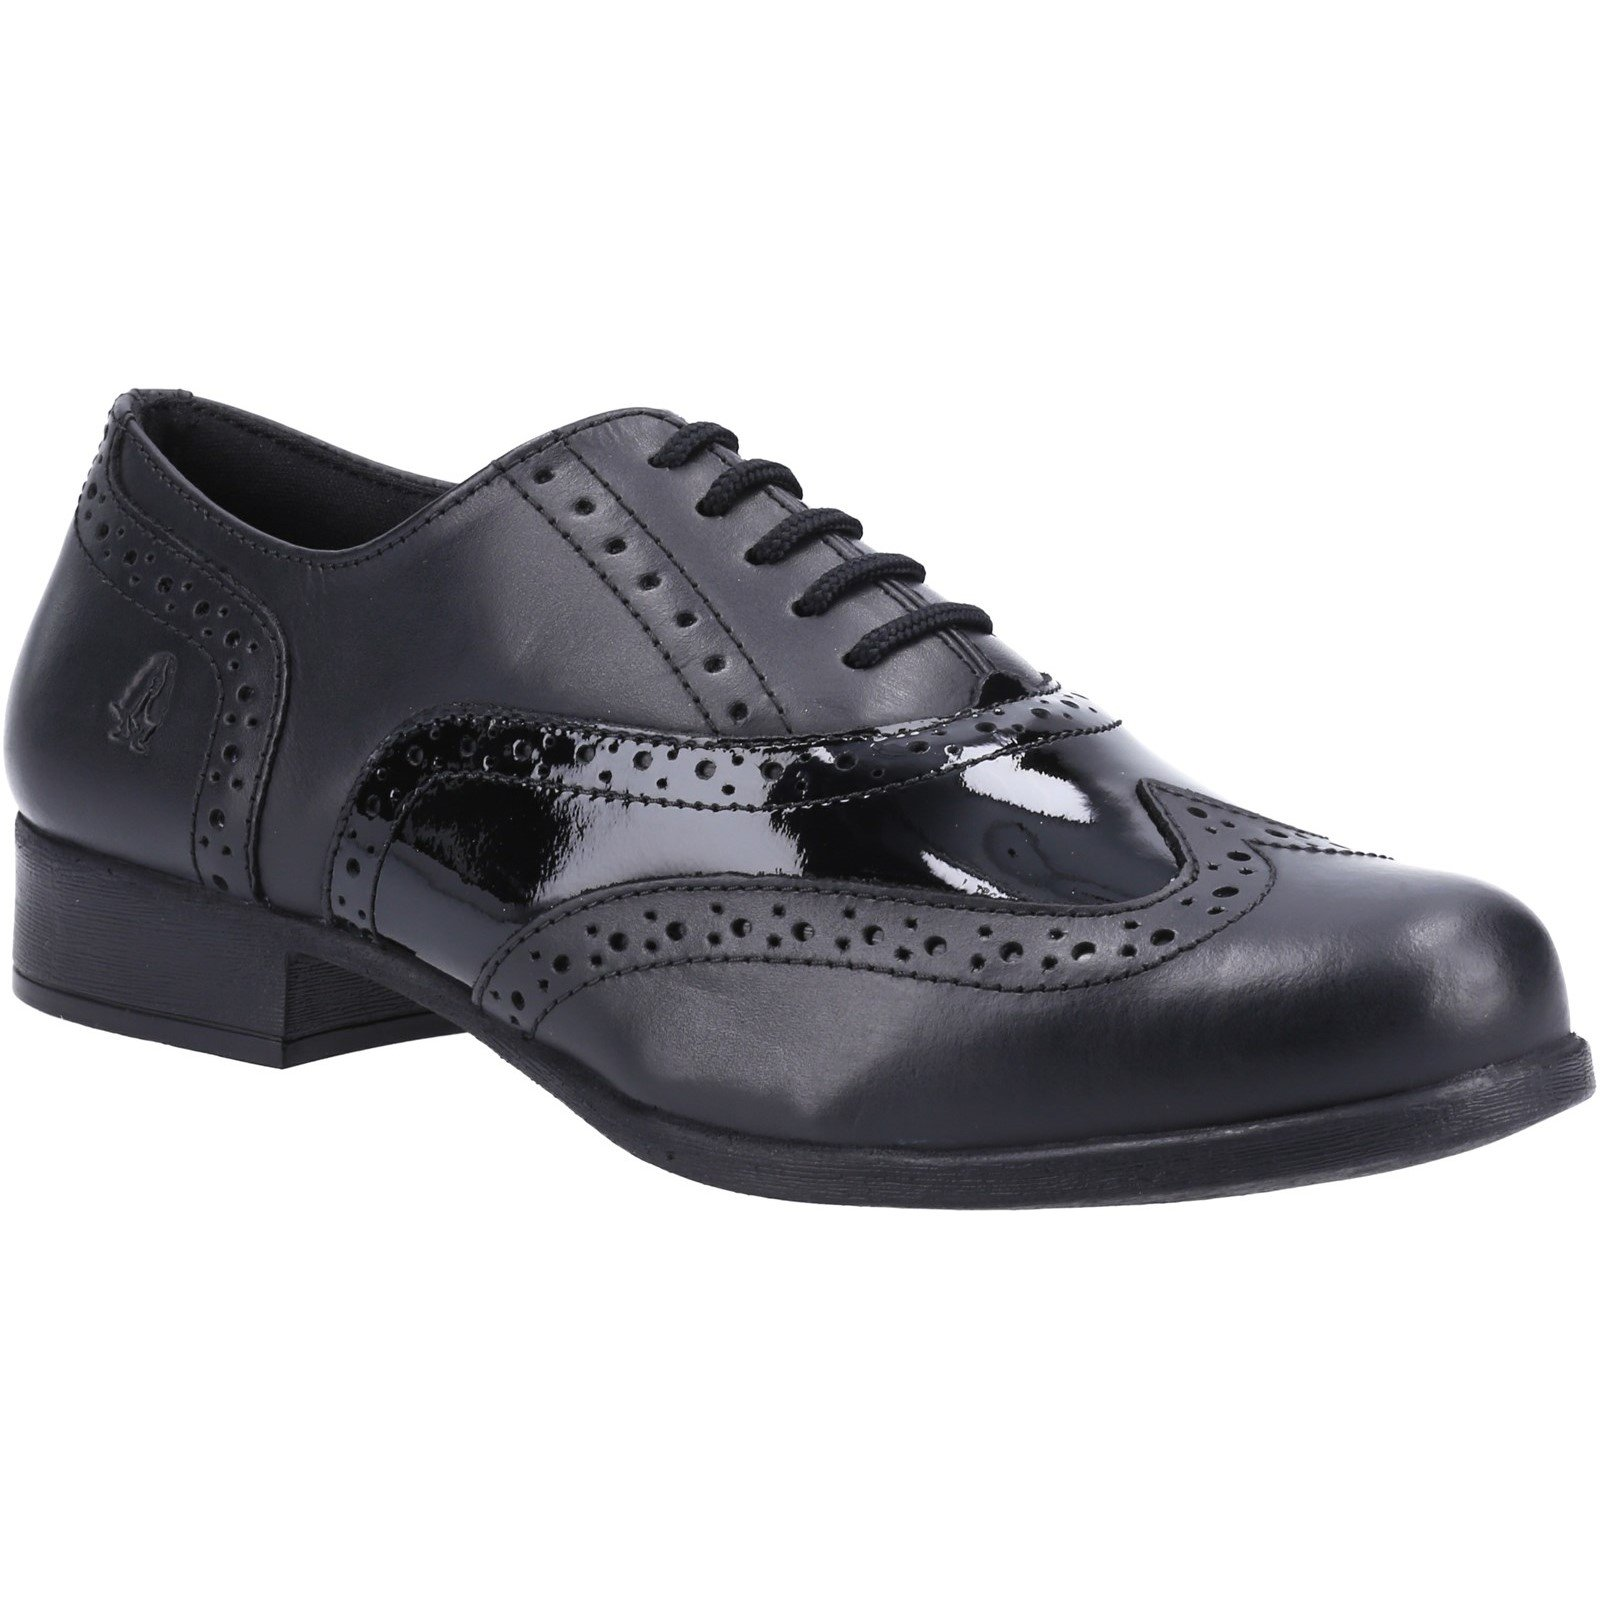 Hush Puppies Kid's Kada Junior School Brogue Shoe Black 33192 - Black 13